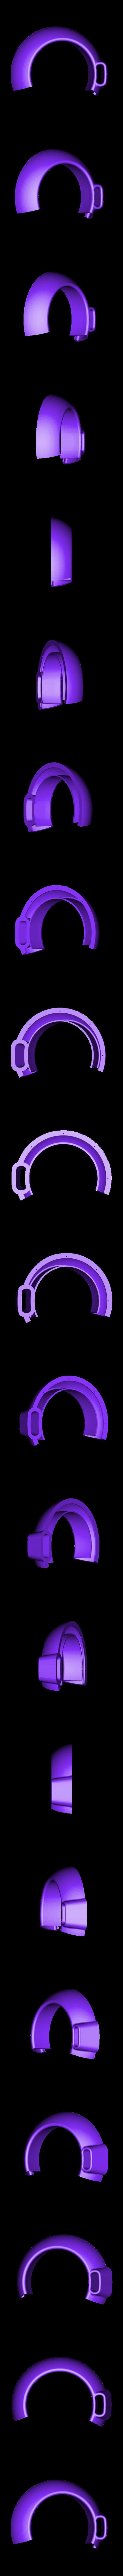 Air-Intake-Cowling301.stl Download free STL file Turboprop Engine • 3D printable model, konchan77